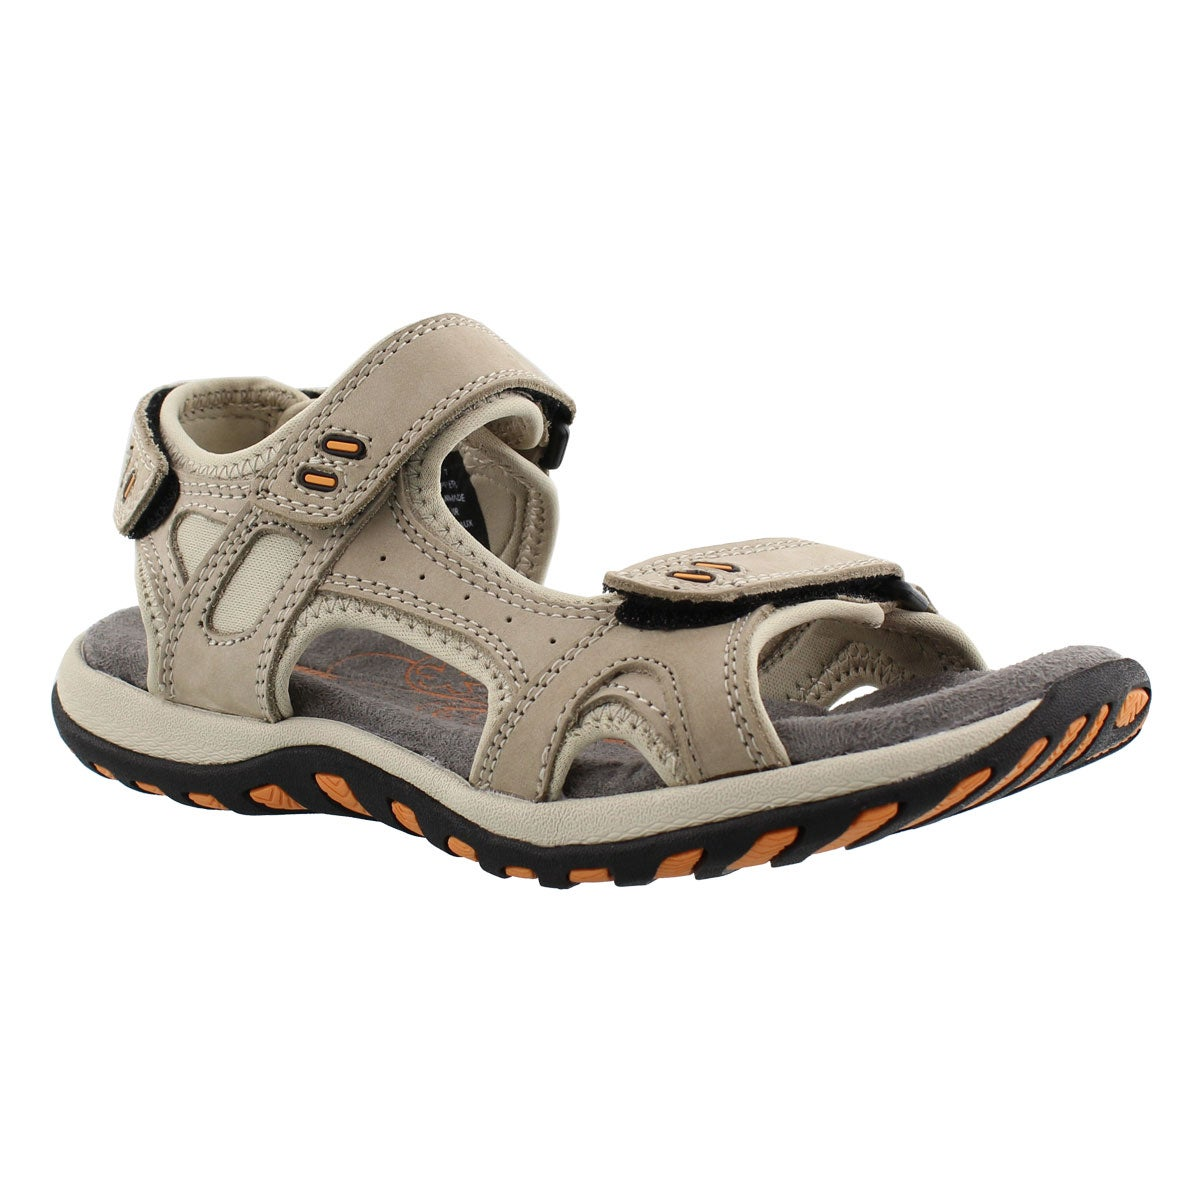 Sandale sport CLARA 2, pierre, femmes